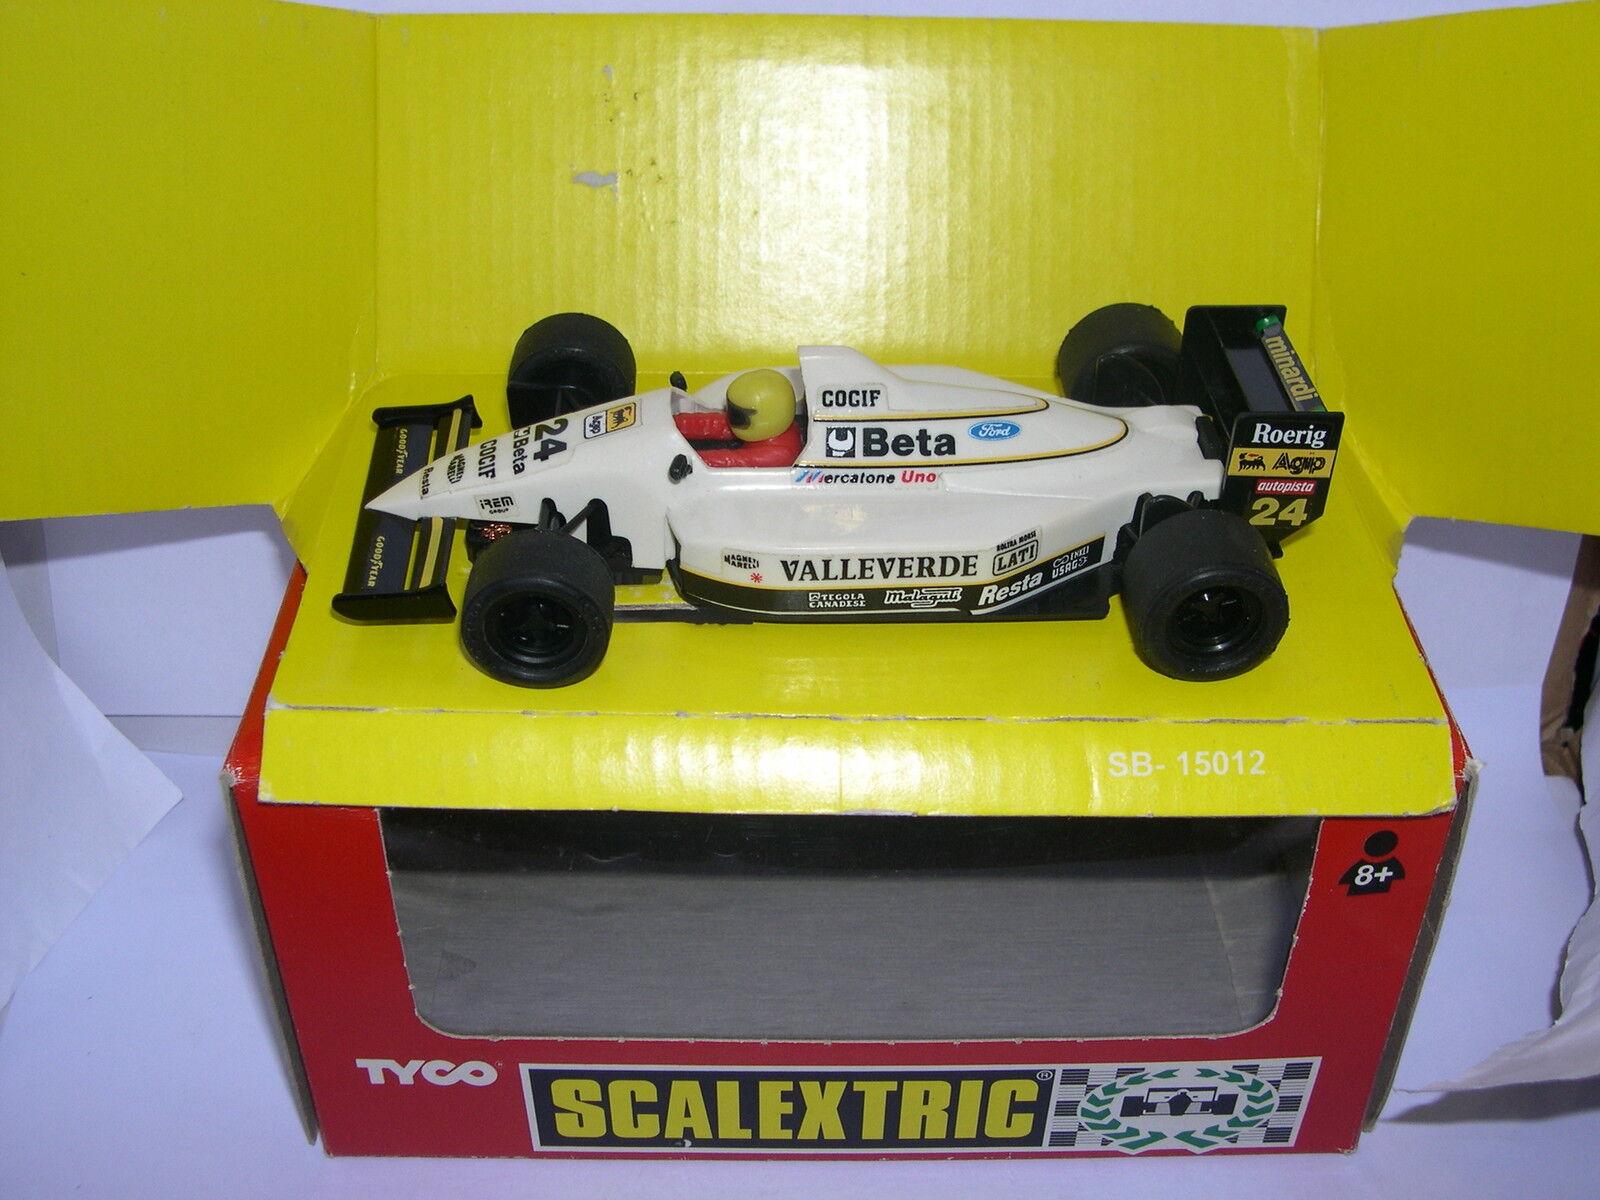 Scalcextric Scx Tyco 8374.09 Minardi F1 Vallegrön MB